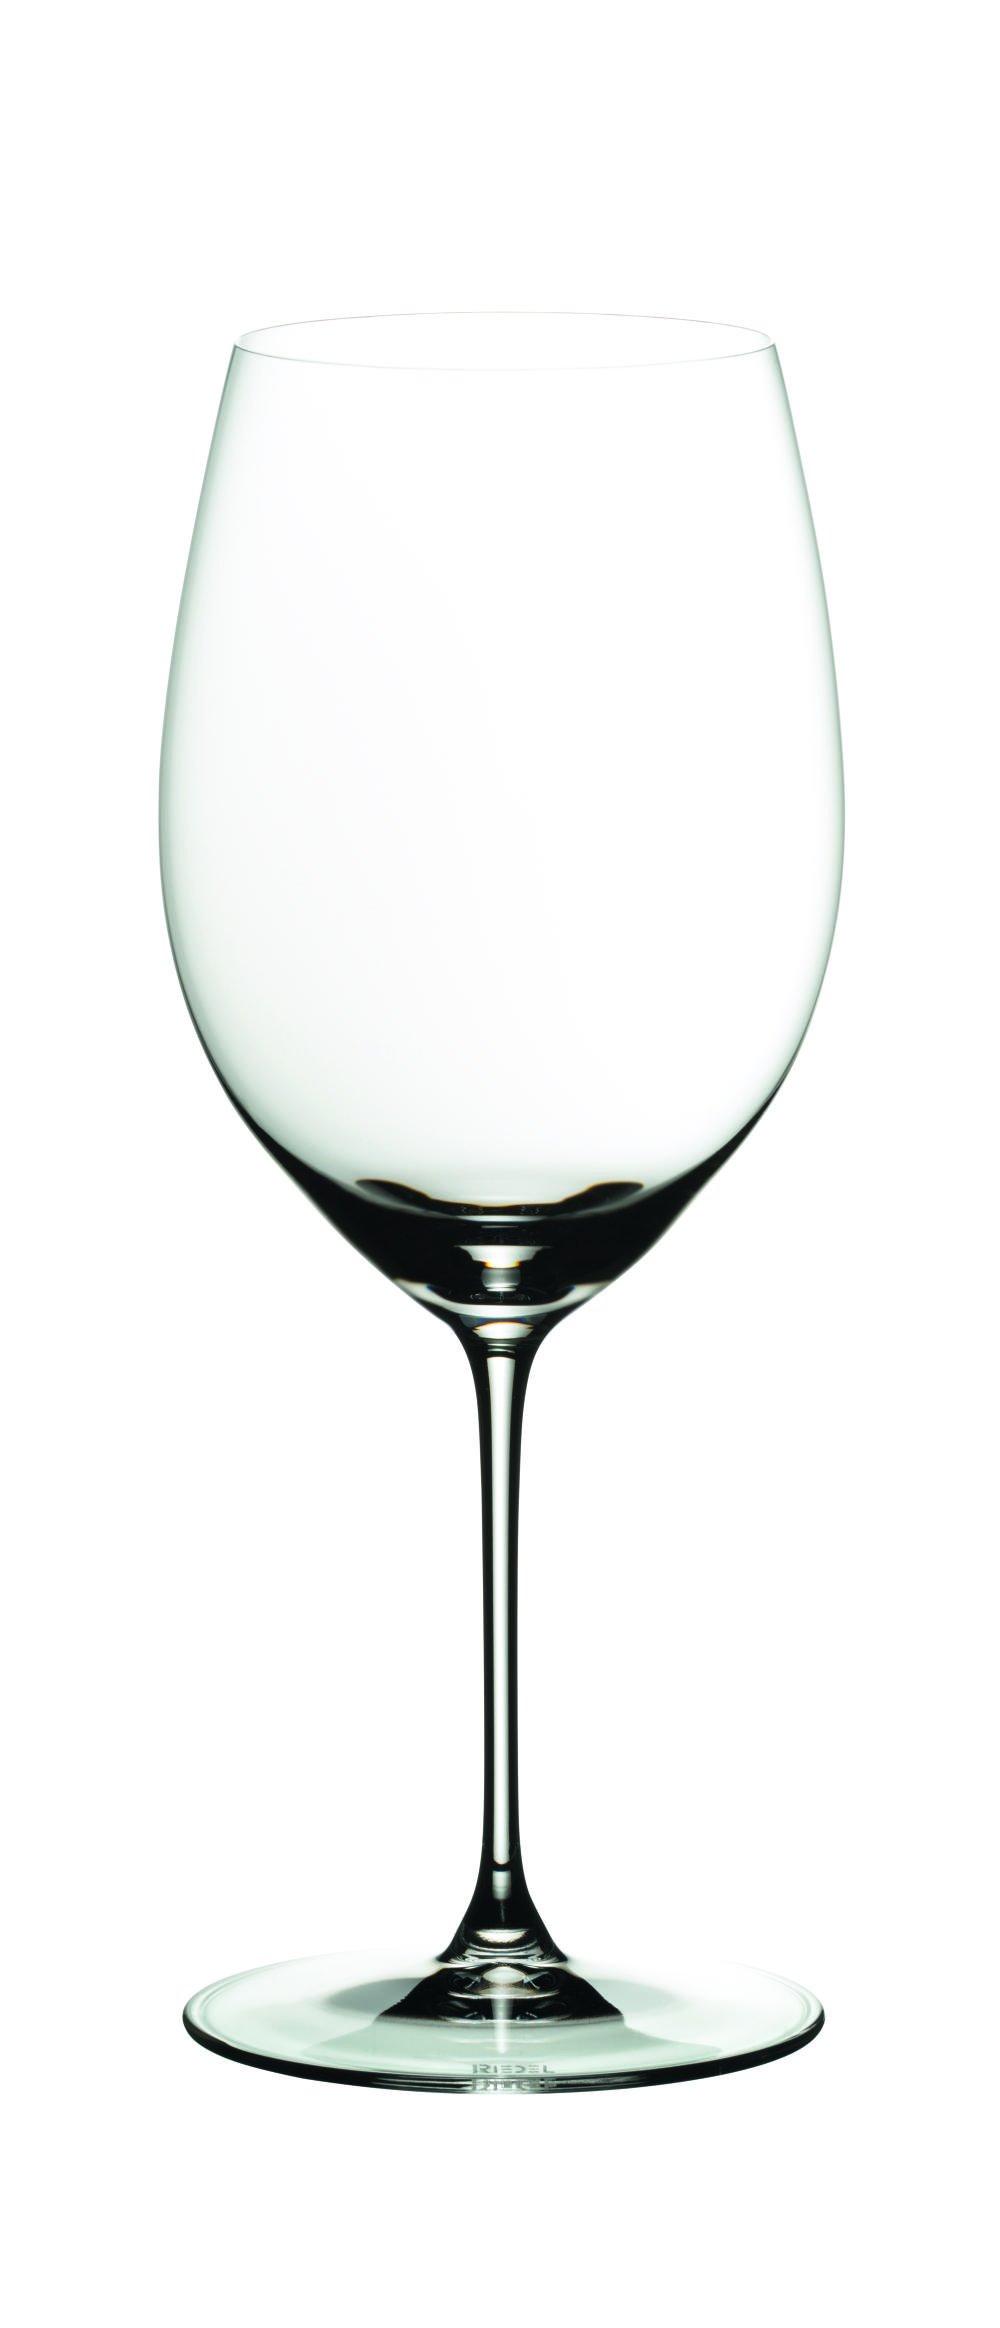 Riedel Veritas Cabernet/Merlot Glass, Clear, Set of 8